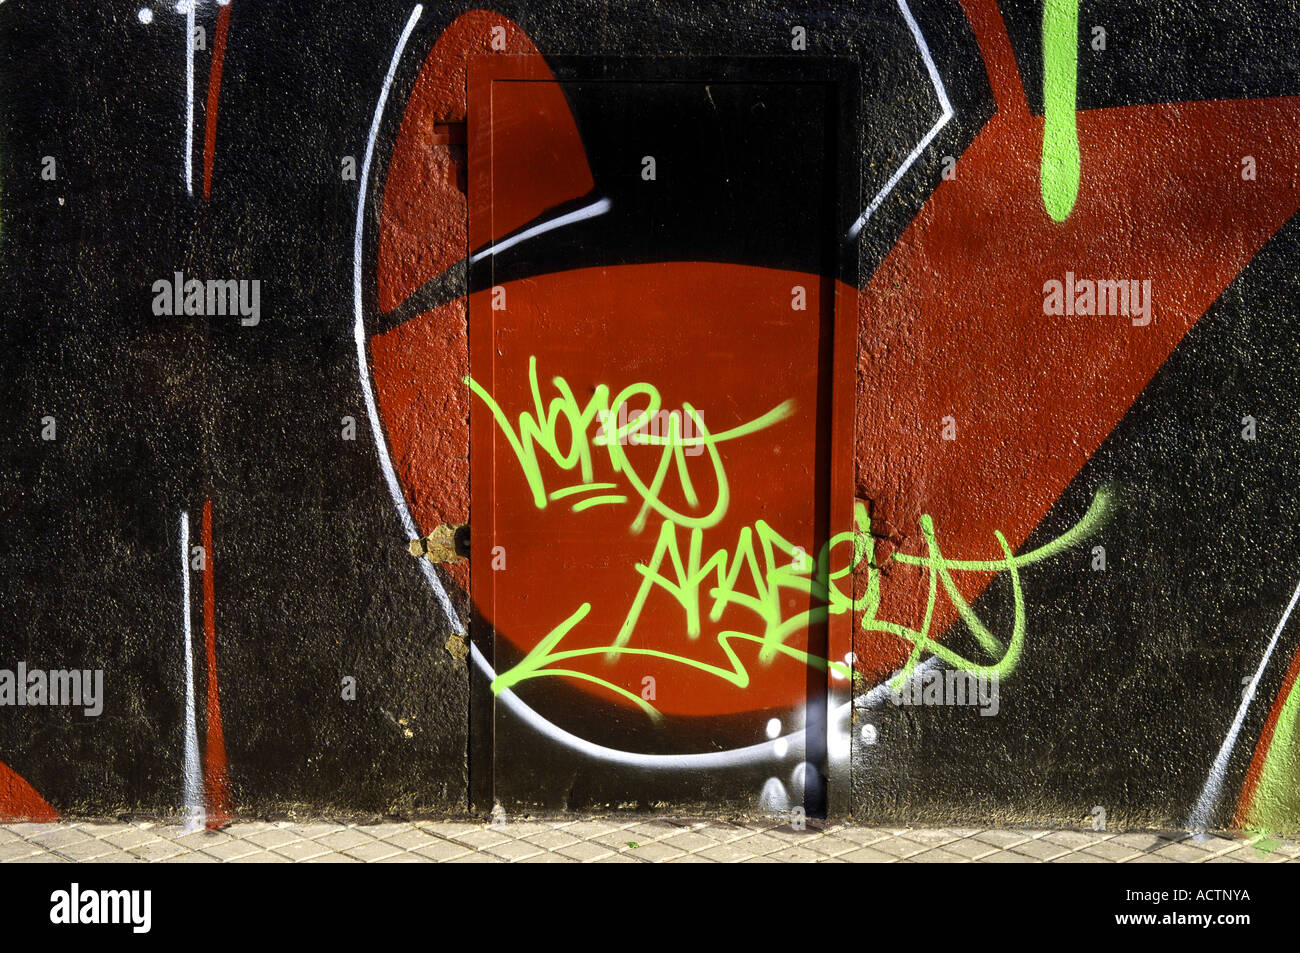 Graffiti graf urban scrawl modern art art spraypaint anti social crime criminal damage vandalism aerosol paint